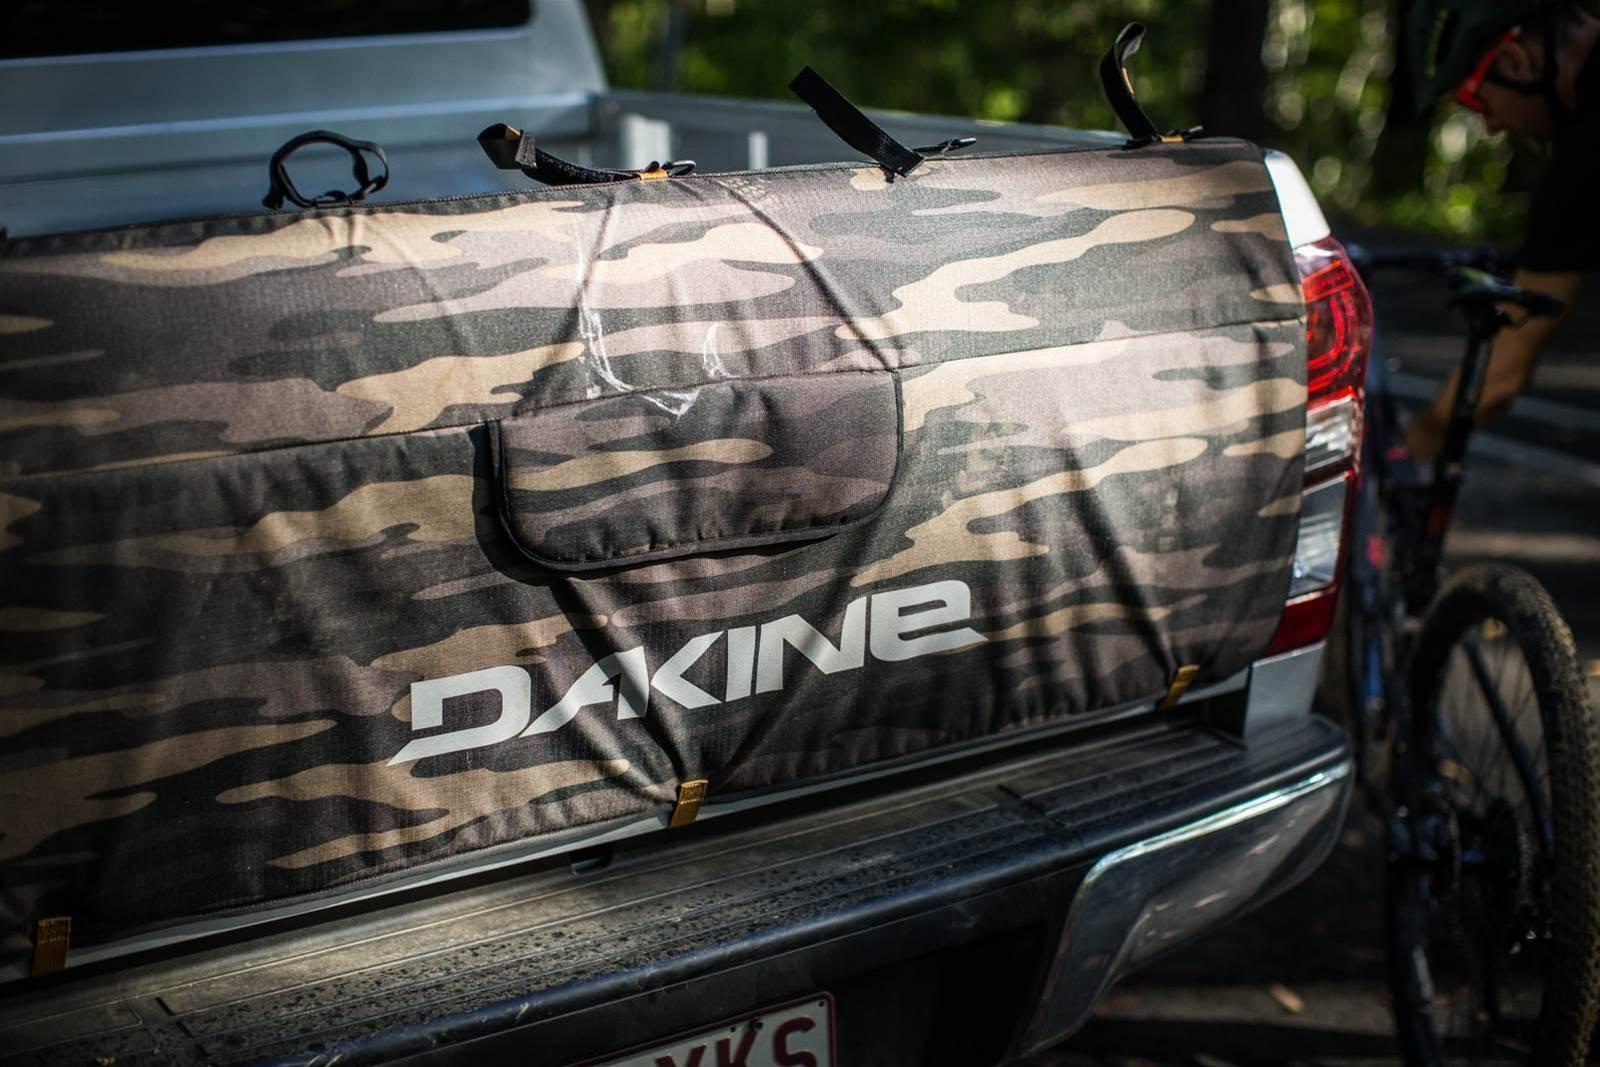 TESTED: Dakine Pickup Pad